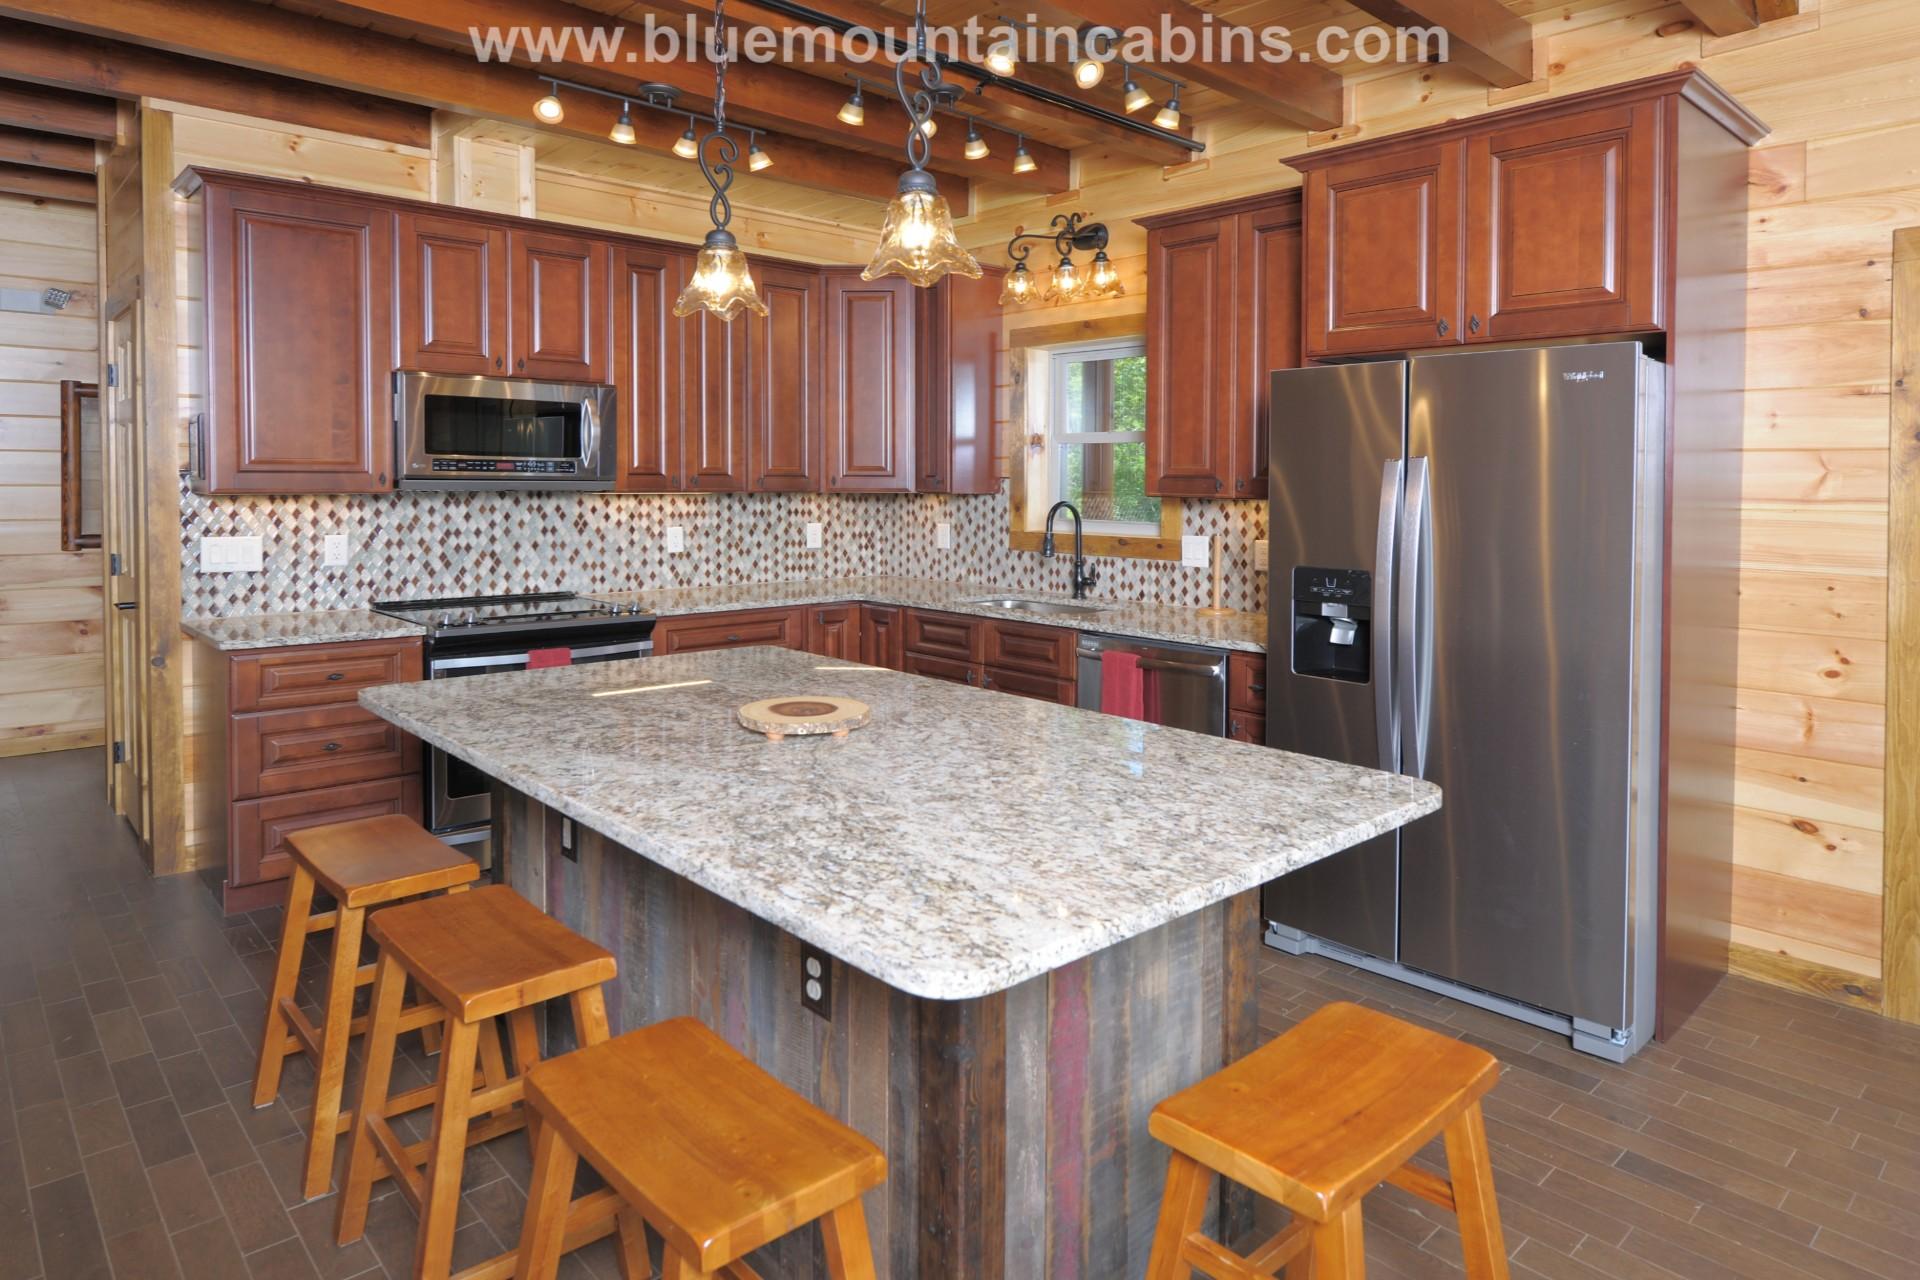 rustic elegant kitchen design in the smokies cabin